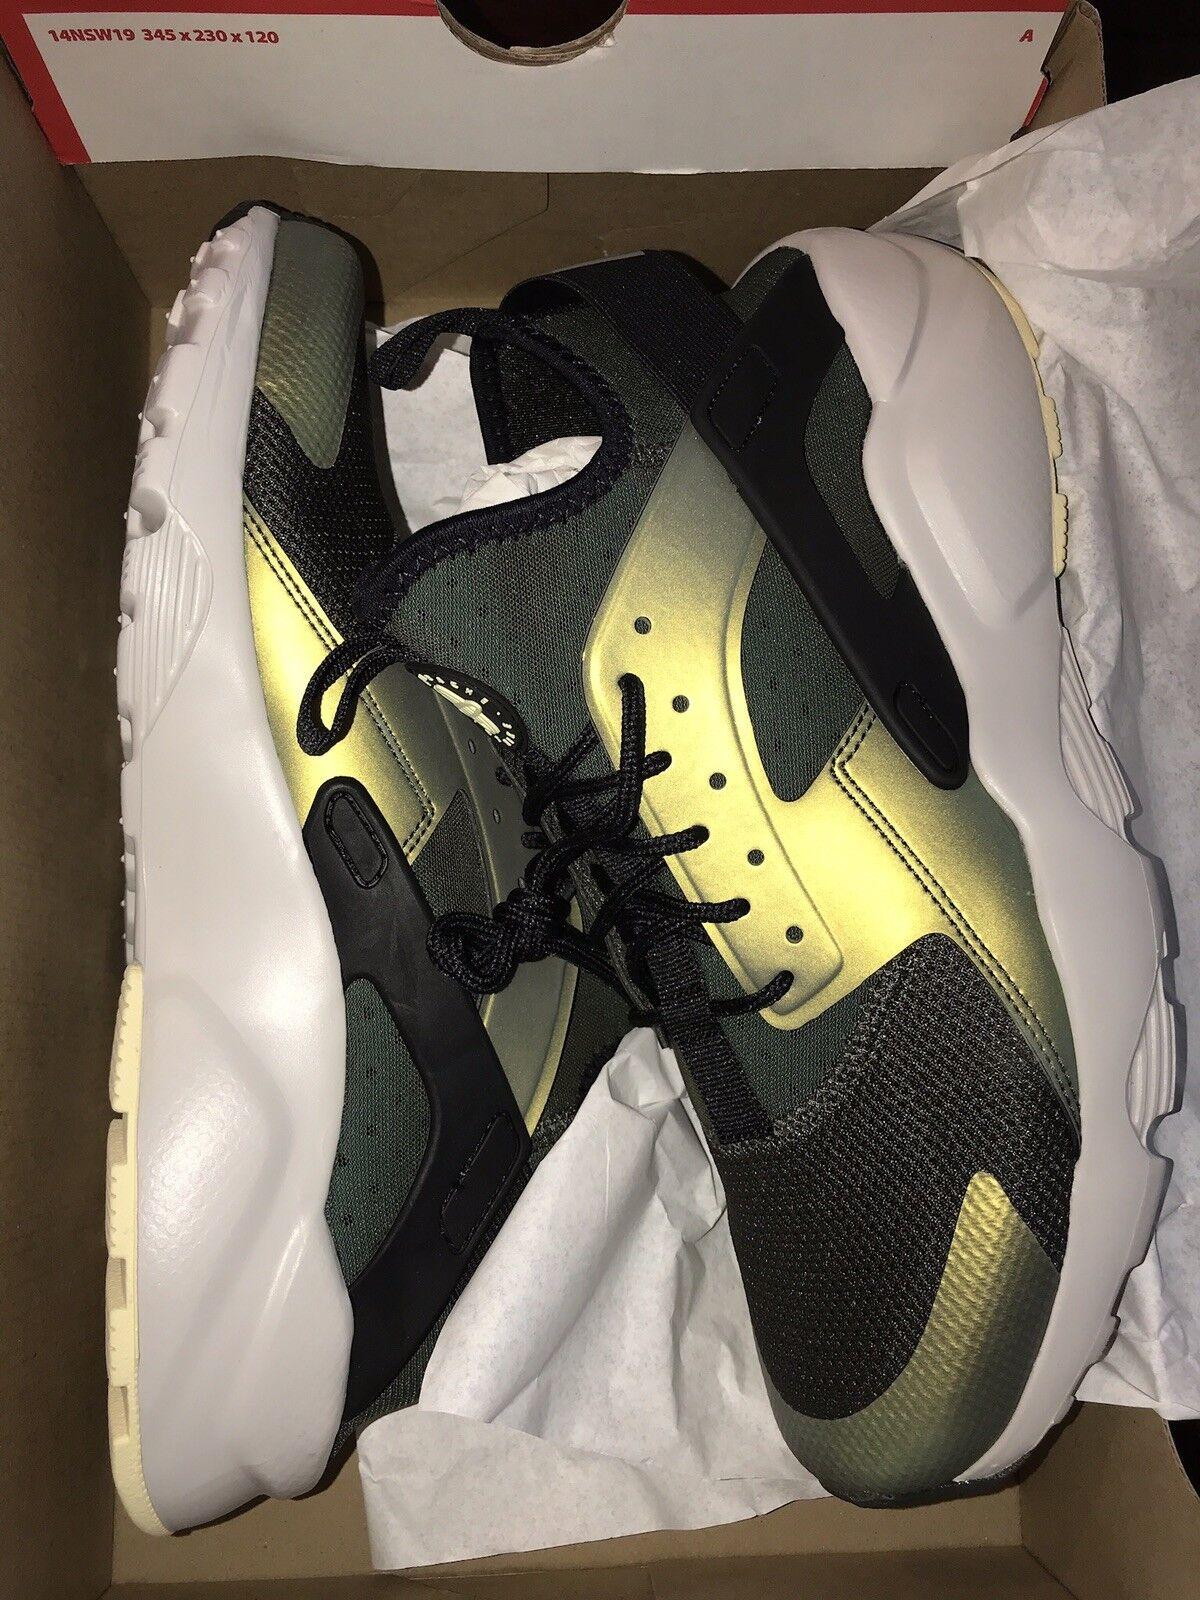 Nike Air Huarache Run Ultra Men's Shoes  875841-302 Size 10.5